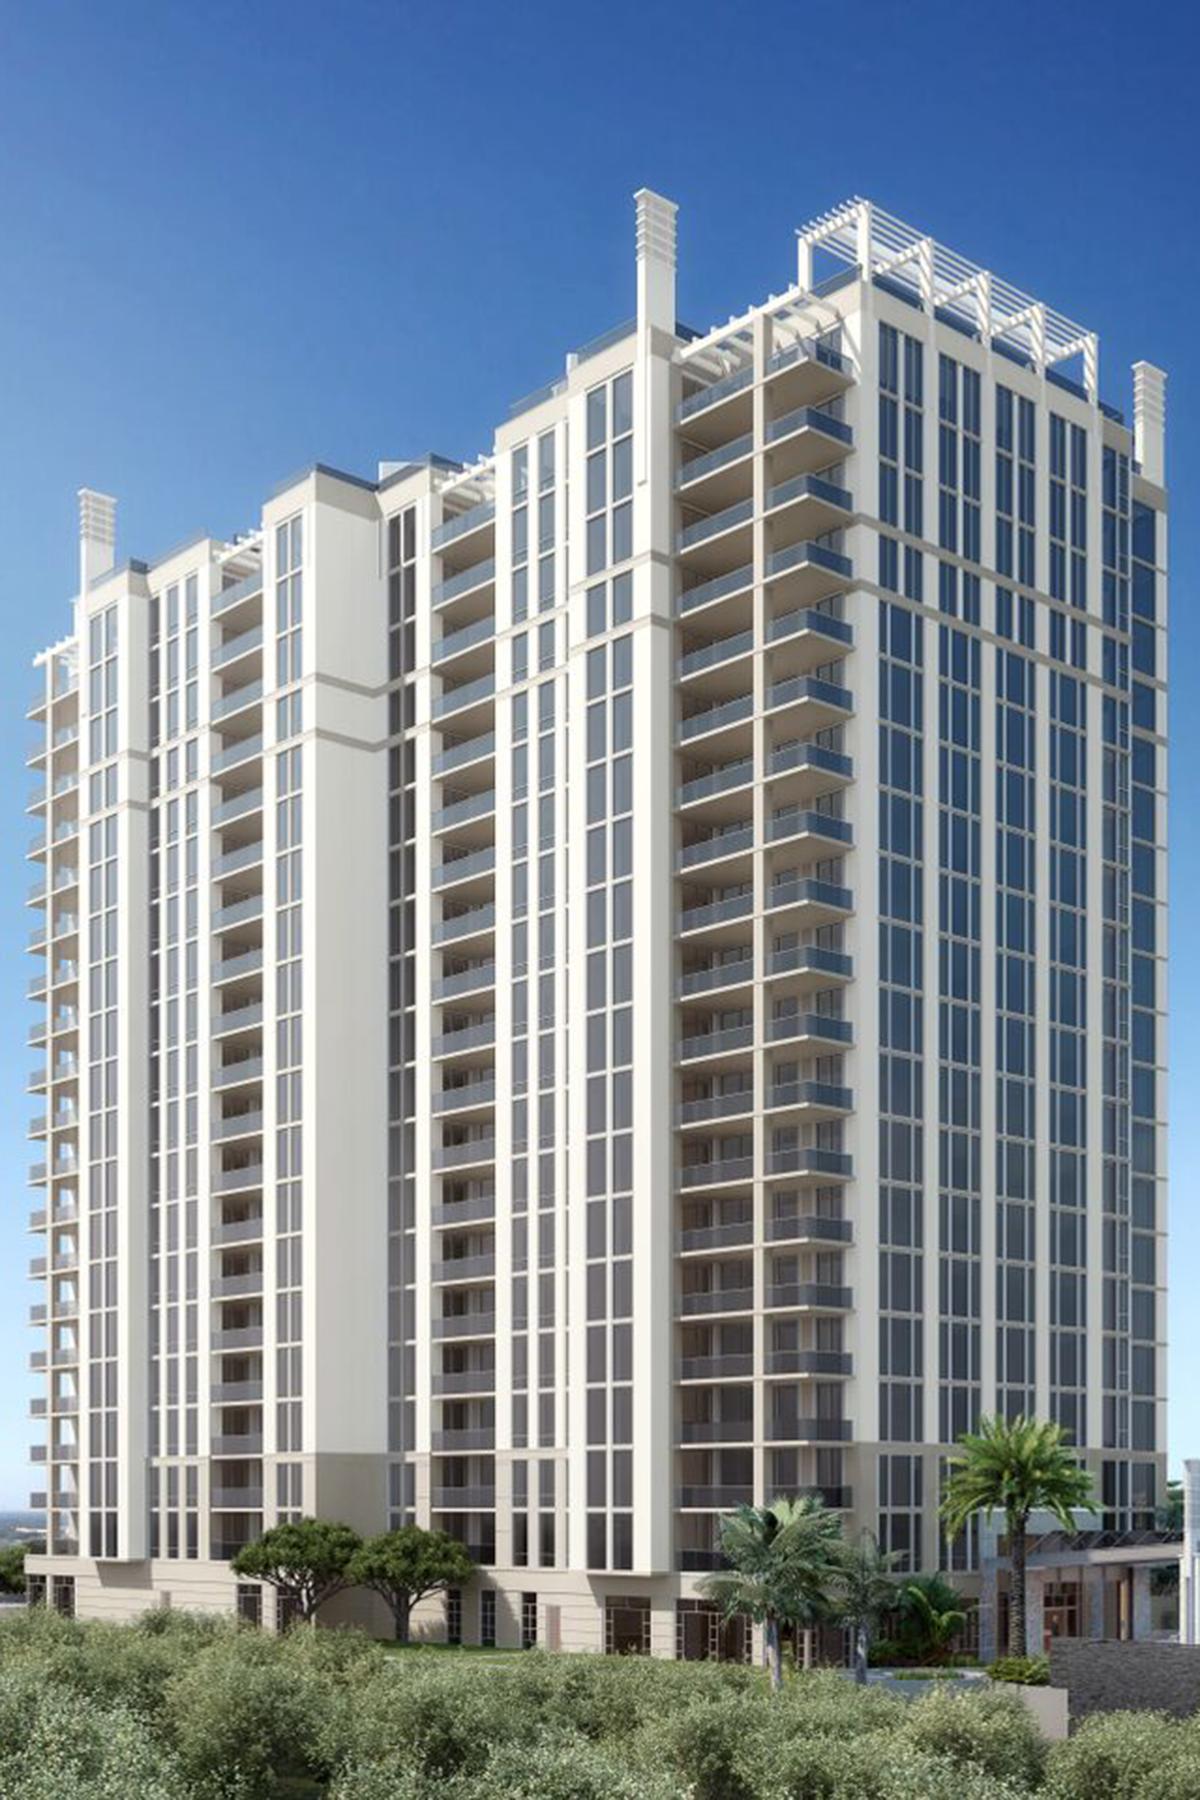 Additional photo for property listing at Naples 6897  Grenadier Blvd PH01,  Naples, Florida 34108 United States